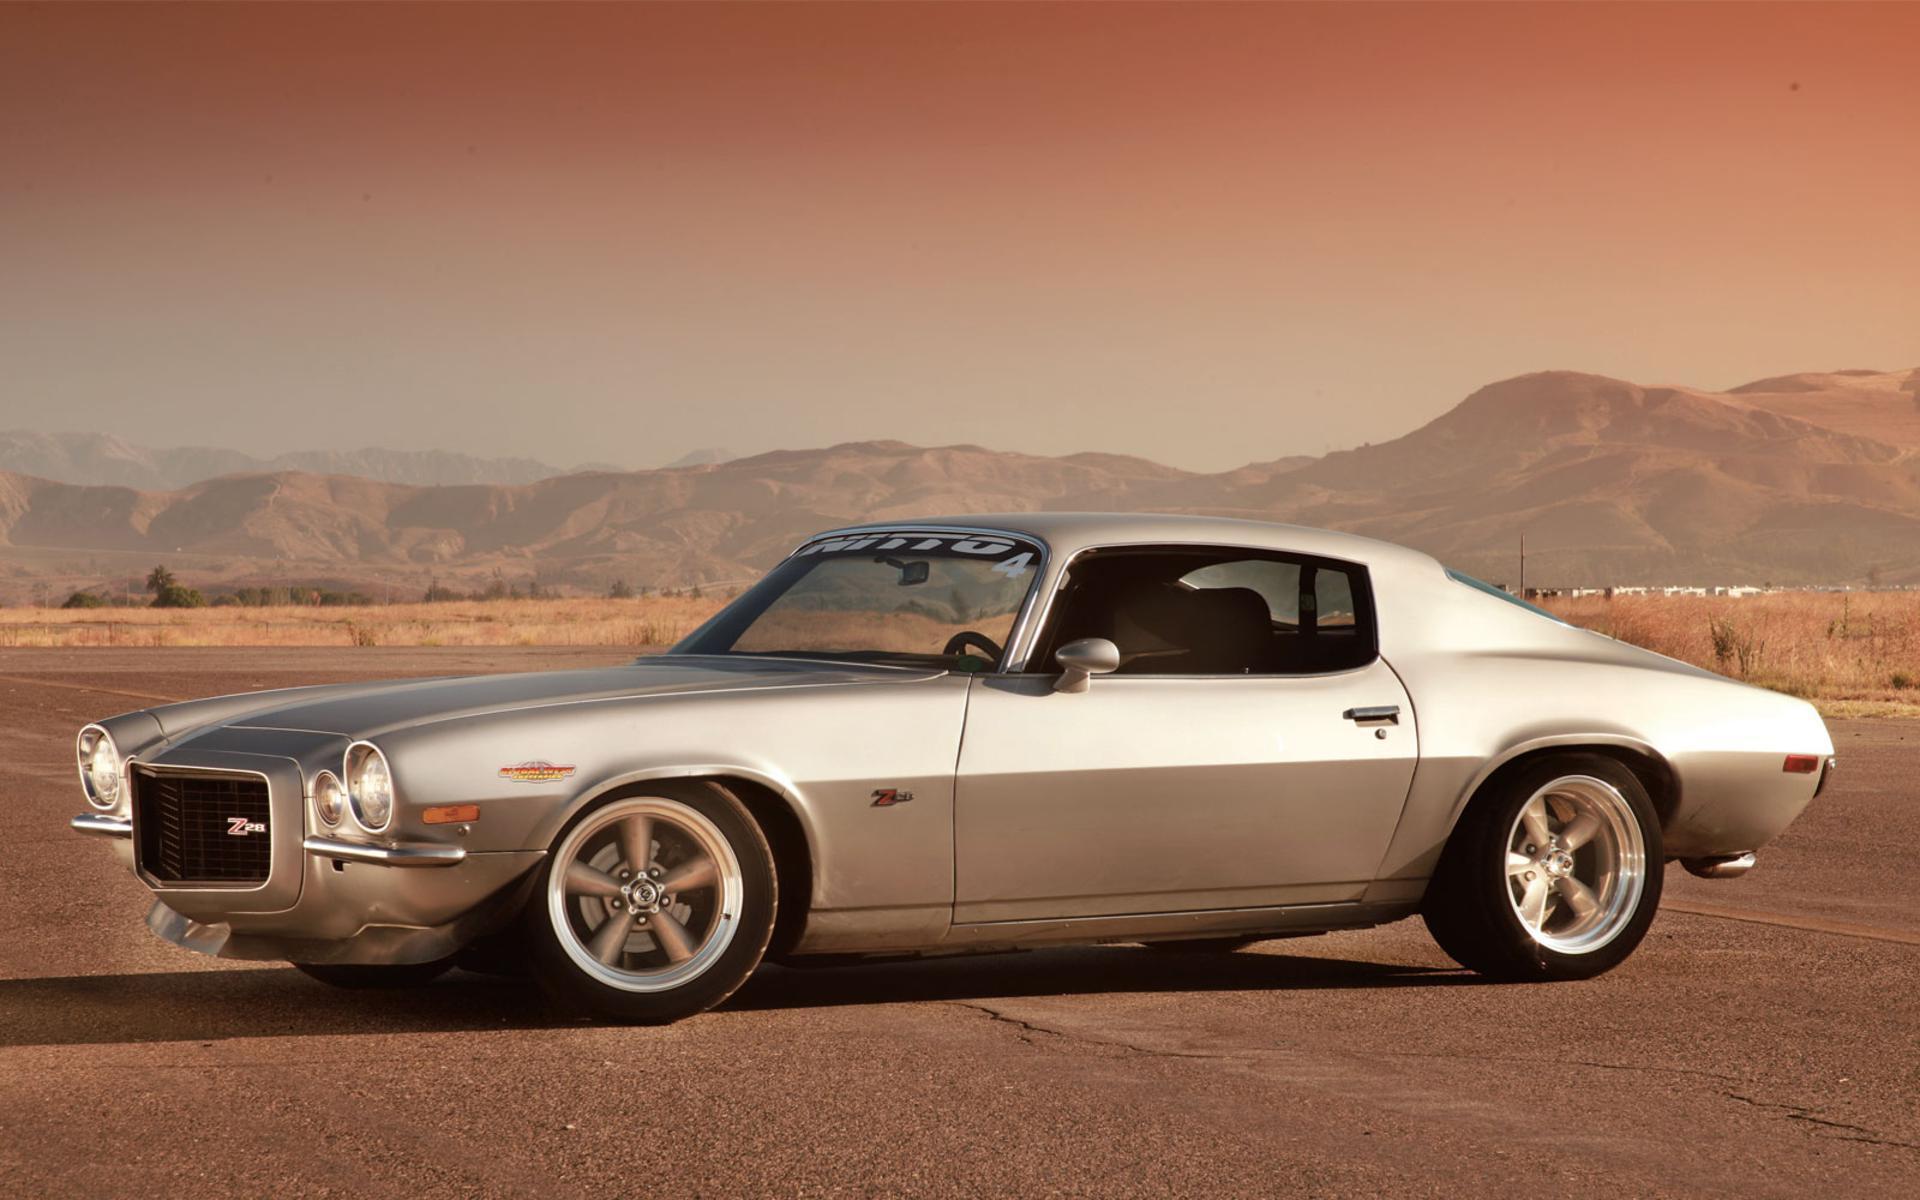 1972 Camaro SS Wallpapers - Top Free 1972 Camaro SS ...